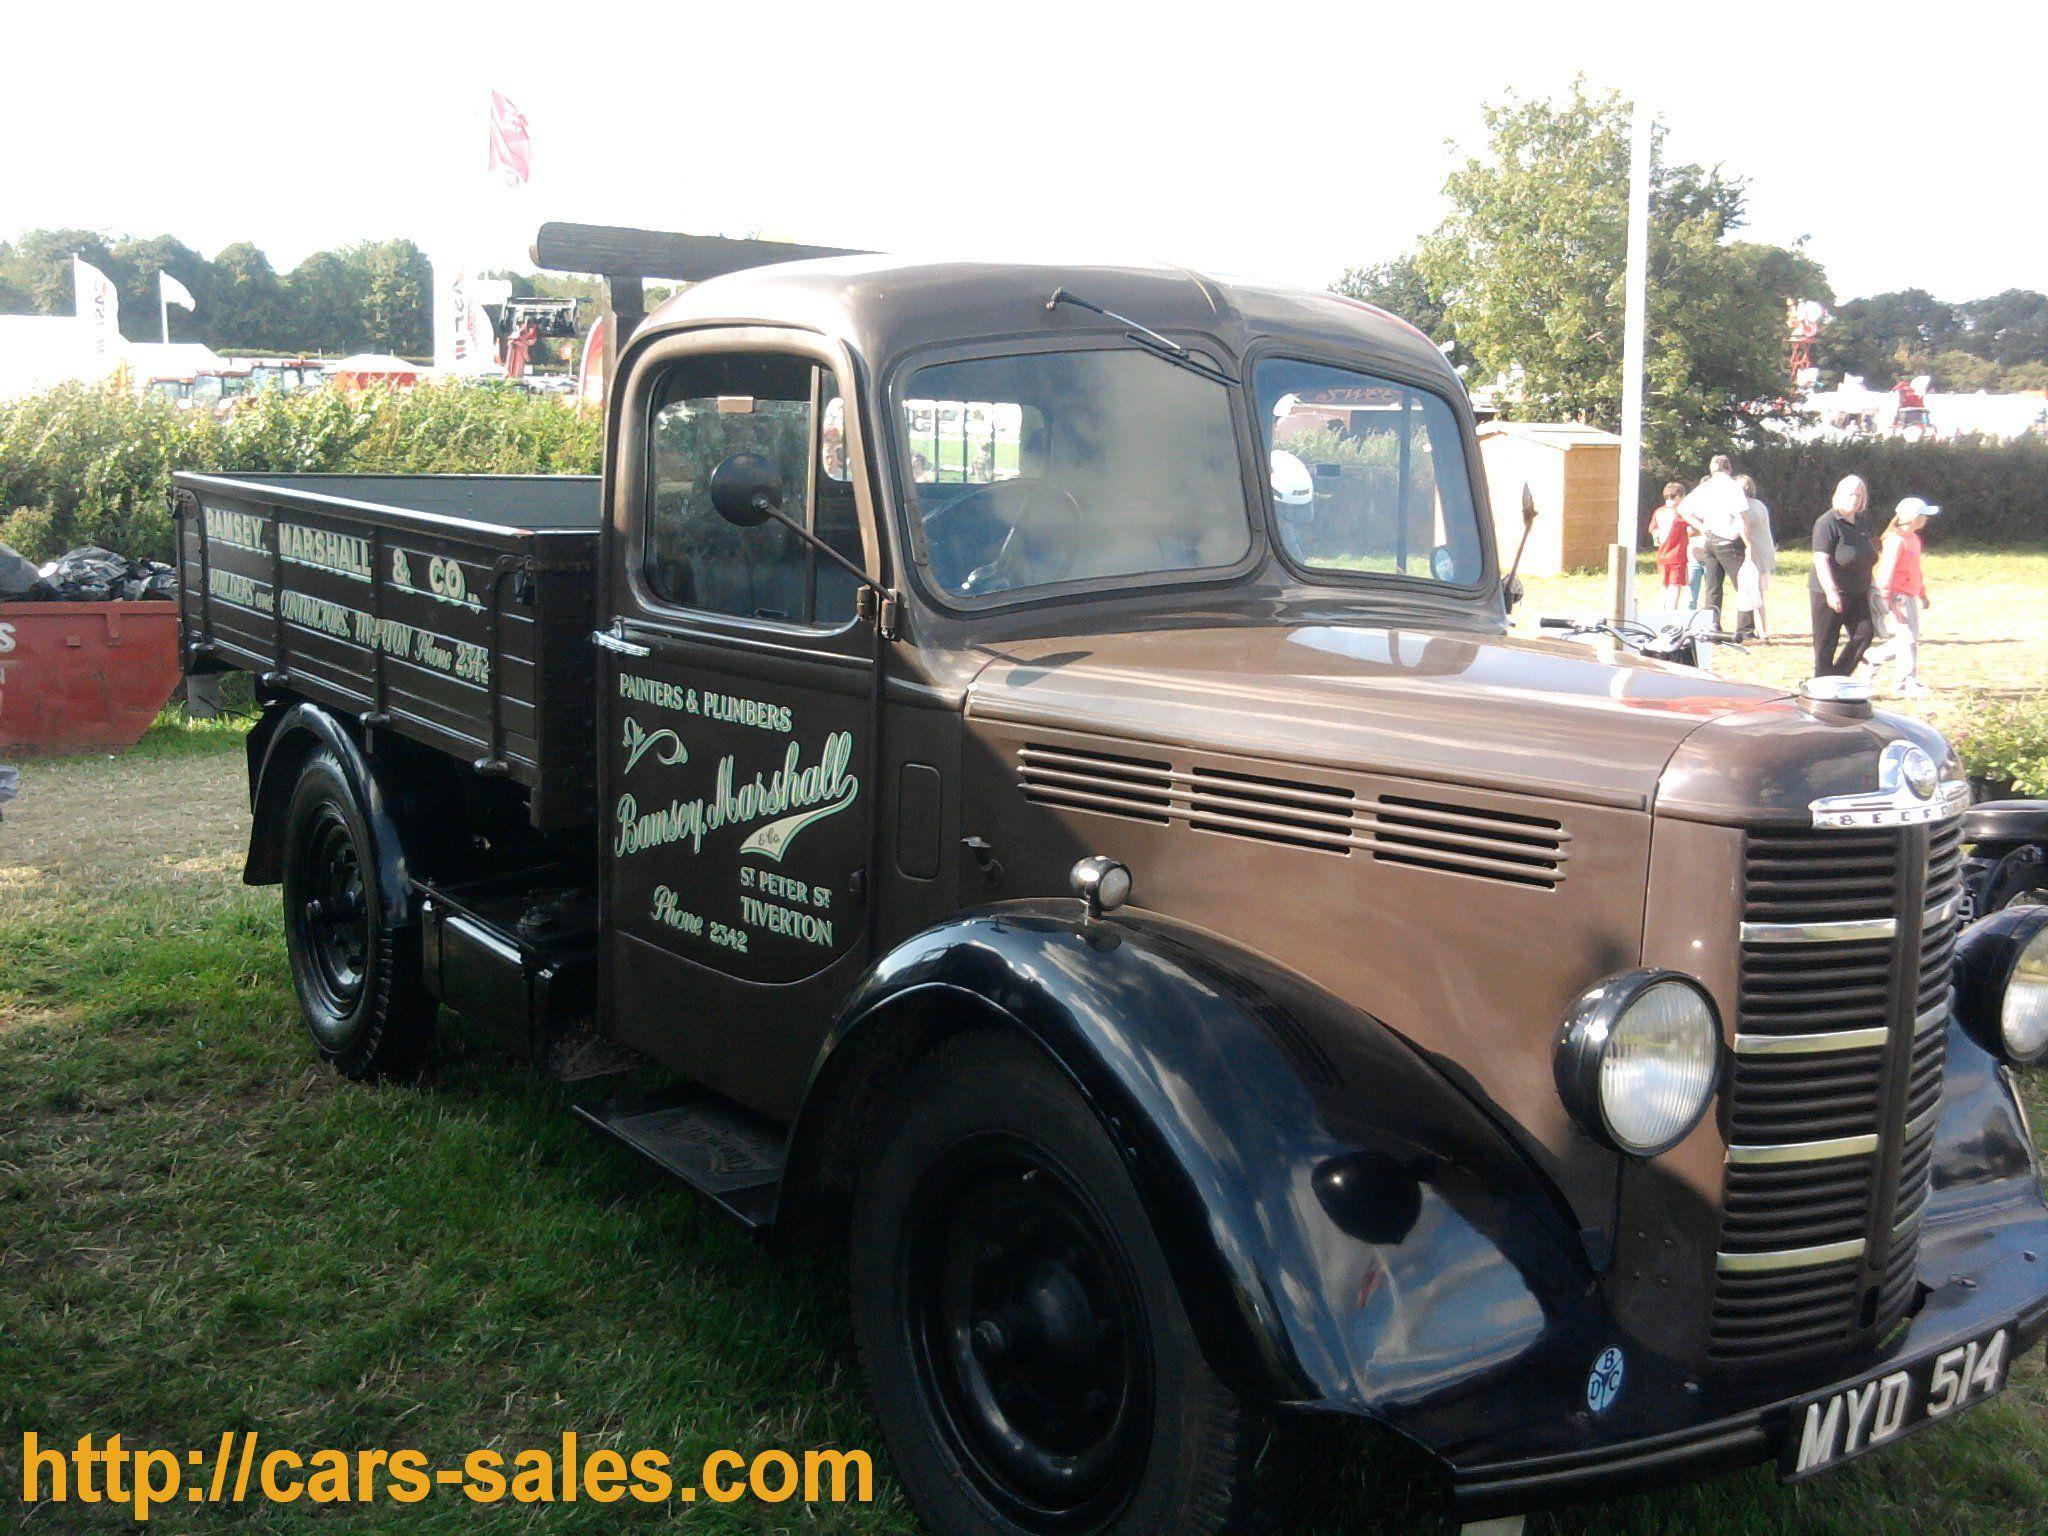 vintage delivery vans for sale | Devon Show – Classic and vintage ...